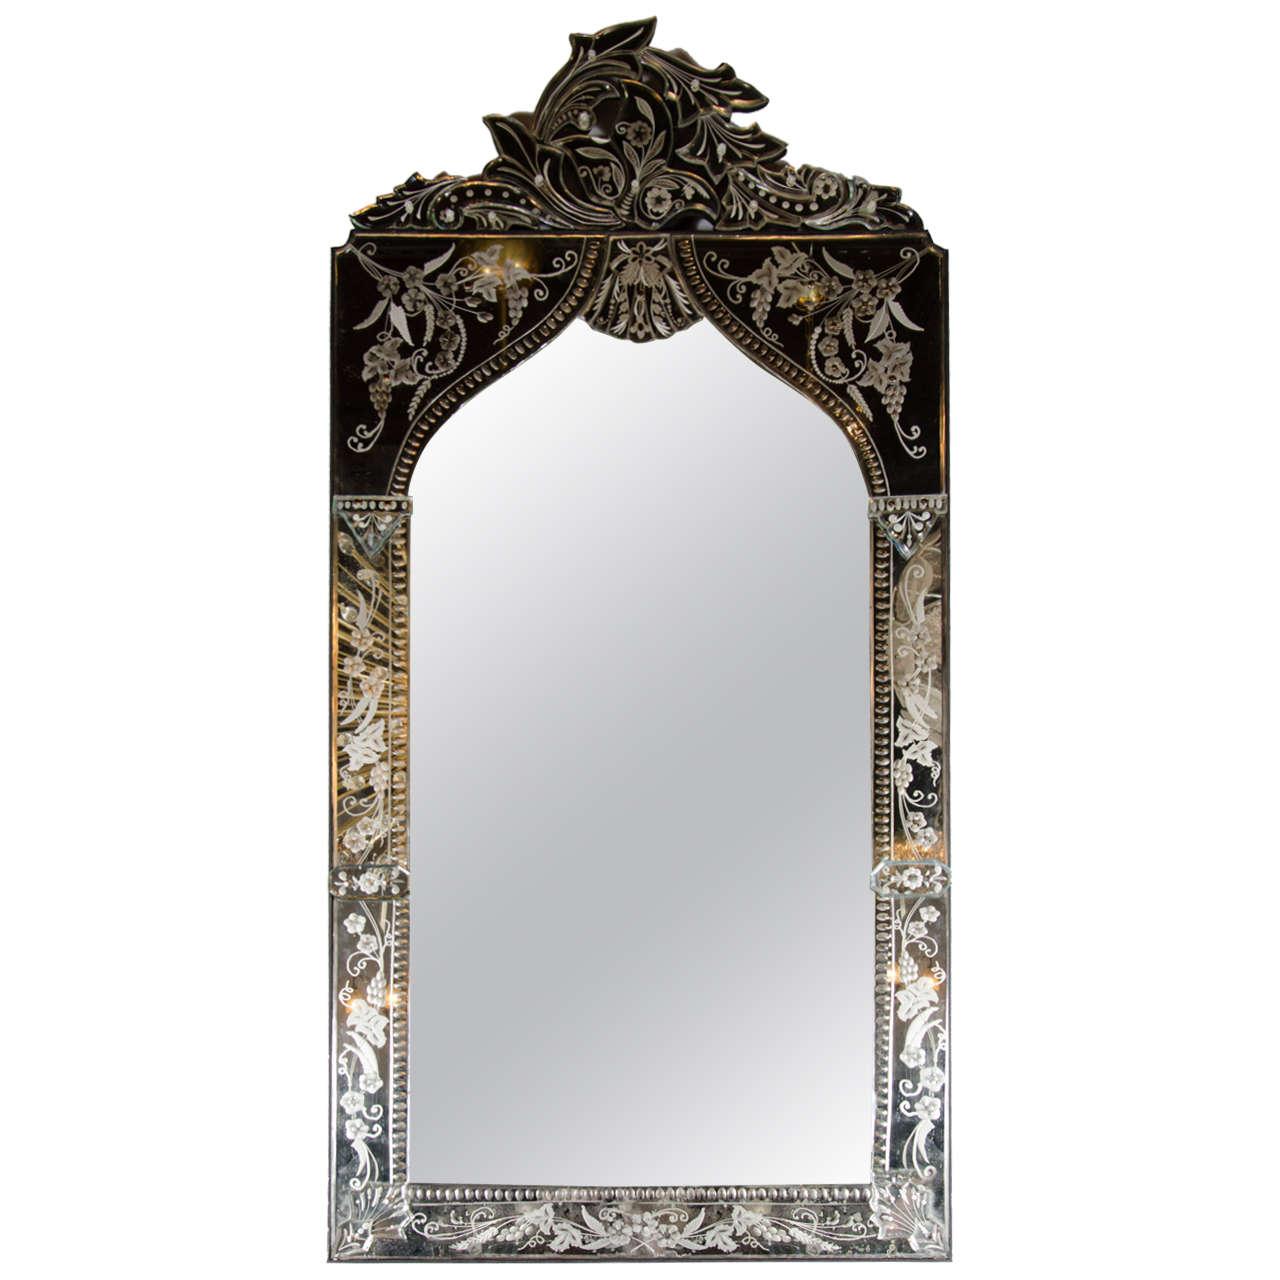 Exquisite Venetian Arabesque Style Mirror With Reverse